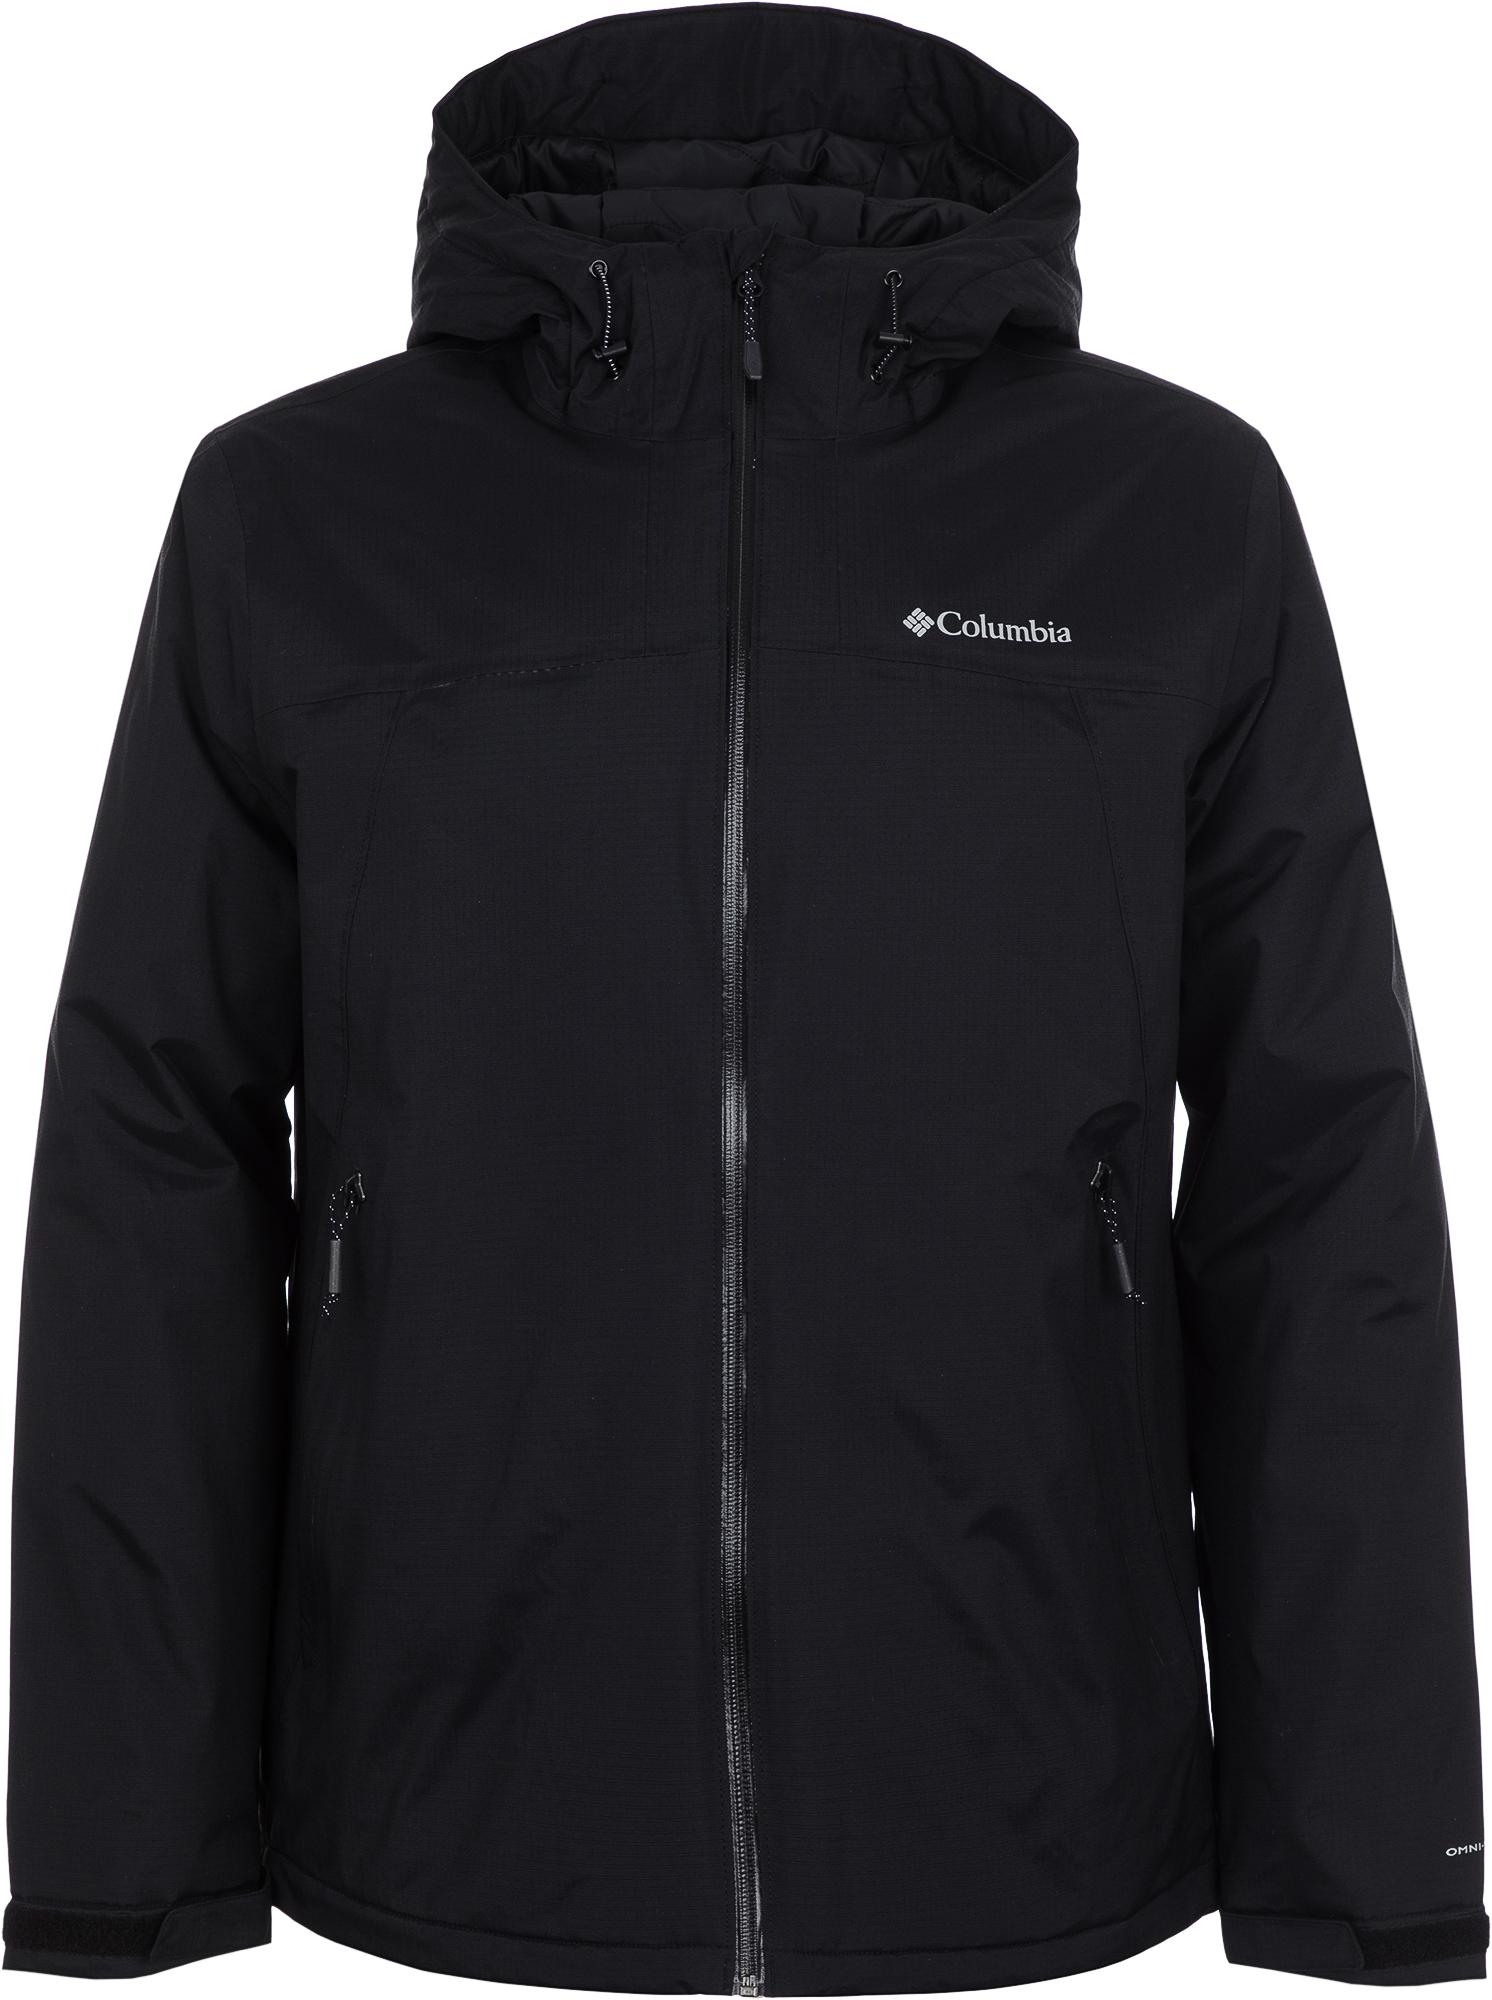 Columbia Куртка утепленная мужская  Sprague Mountain Insulated, размер 46-48